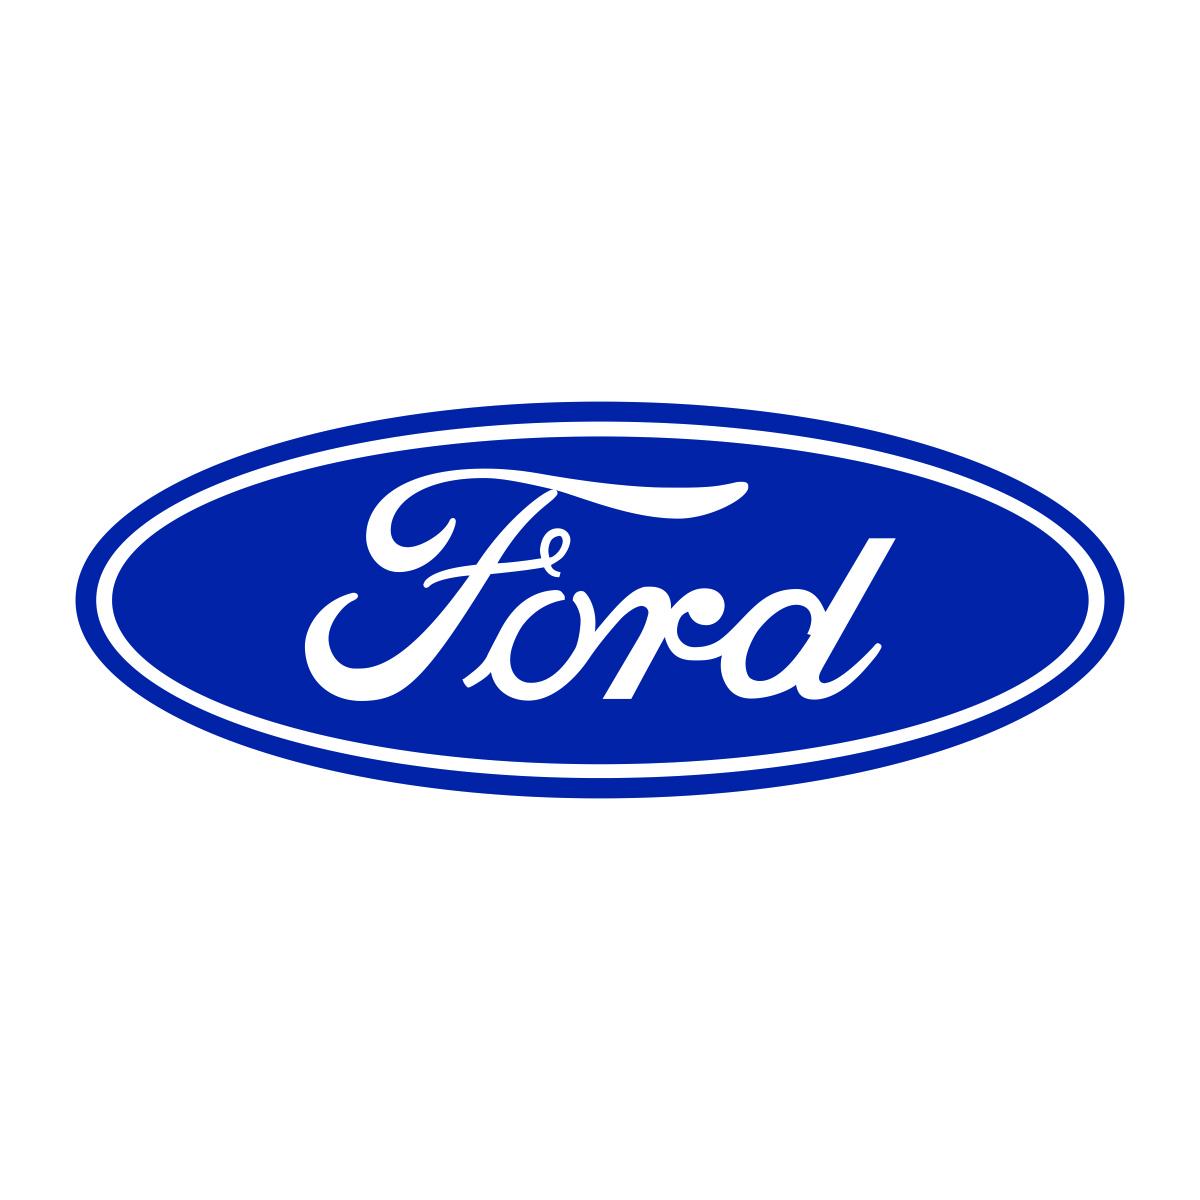 https://promotionplusinc.com/wp-content/uploads/2019/04/Ford.jpg